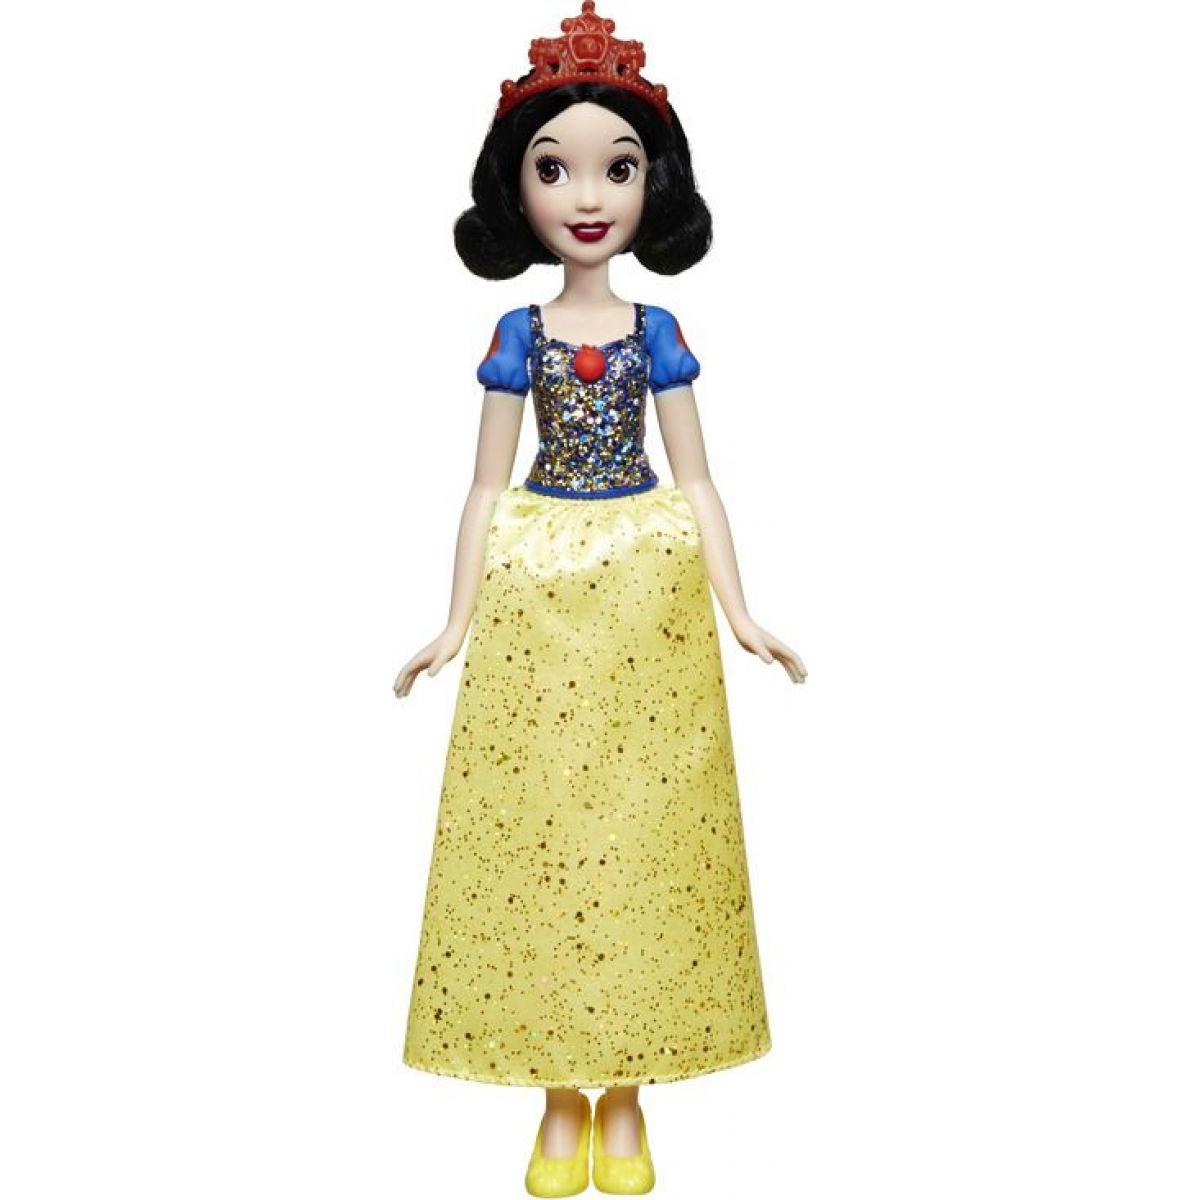 Hasbro Disney Princess panenka Sněhurka